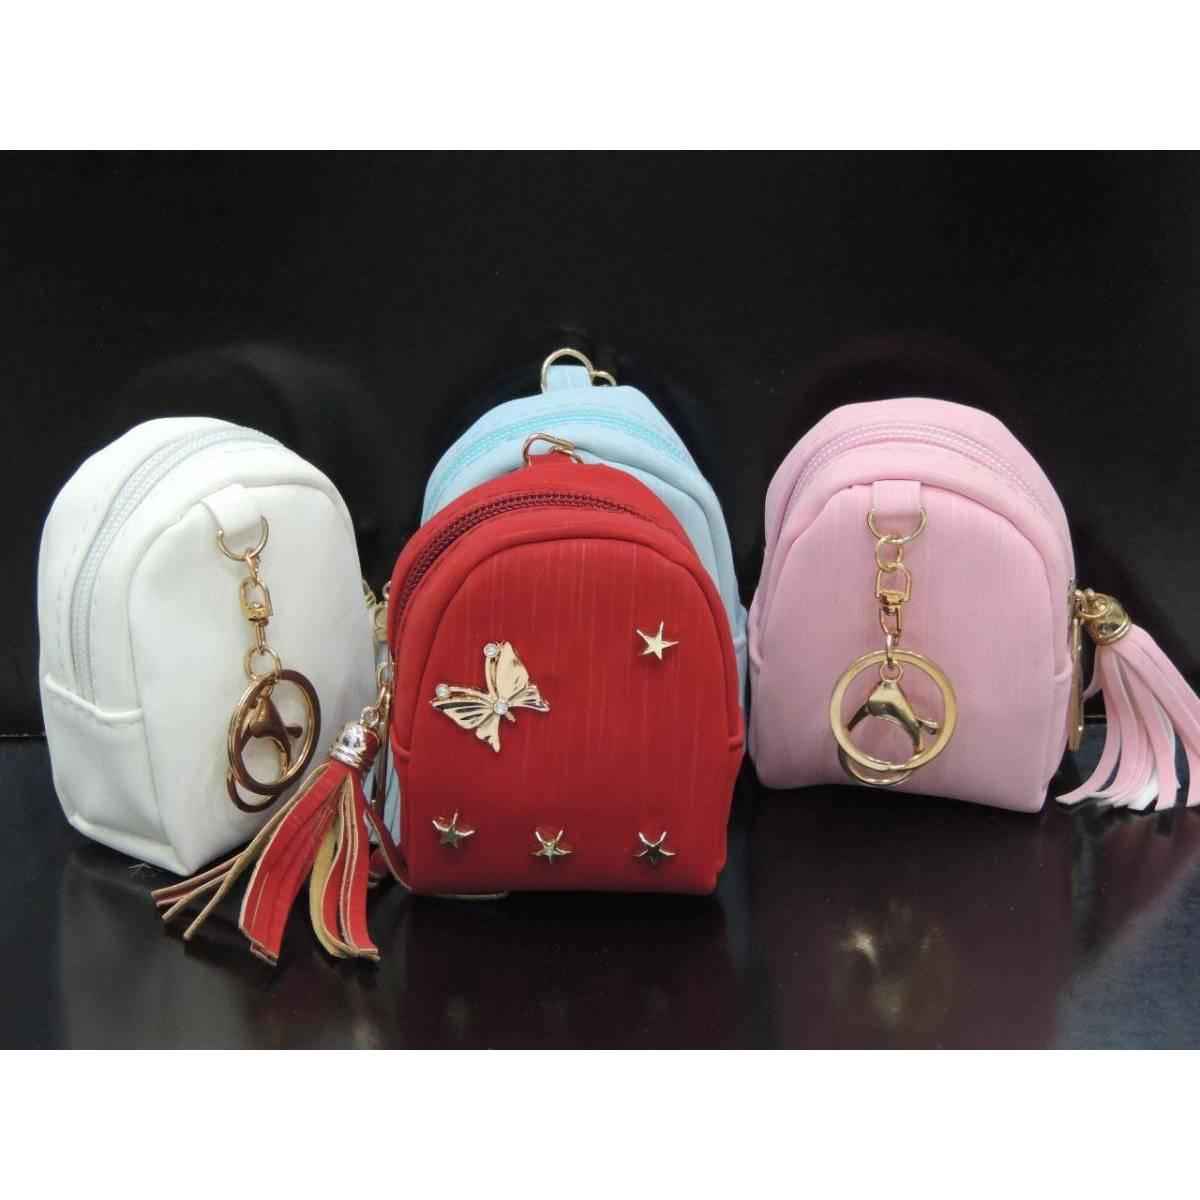 Mini Coin Purse Girls Small Key Chain Bag Hand Pouch Money Wallet